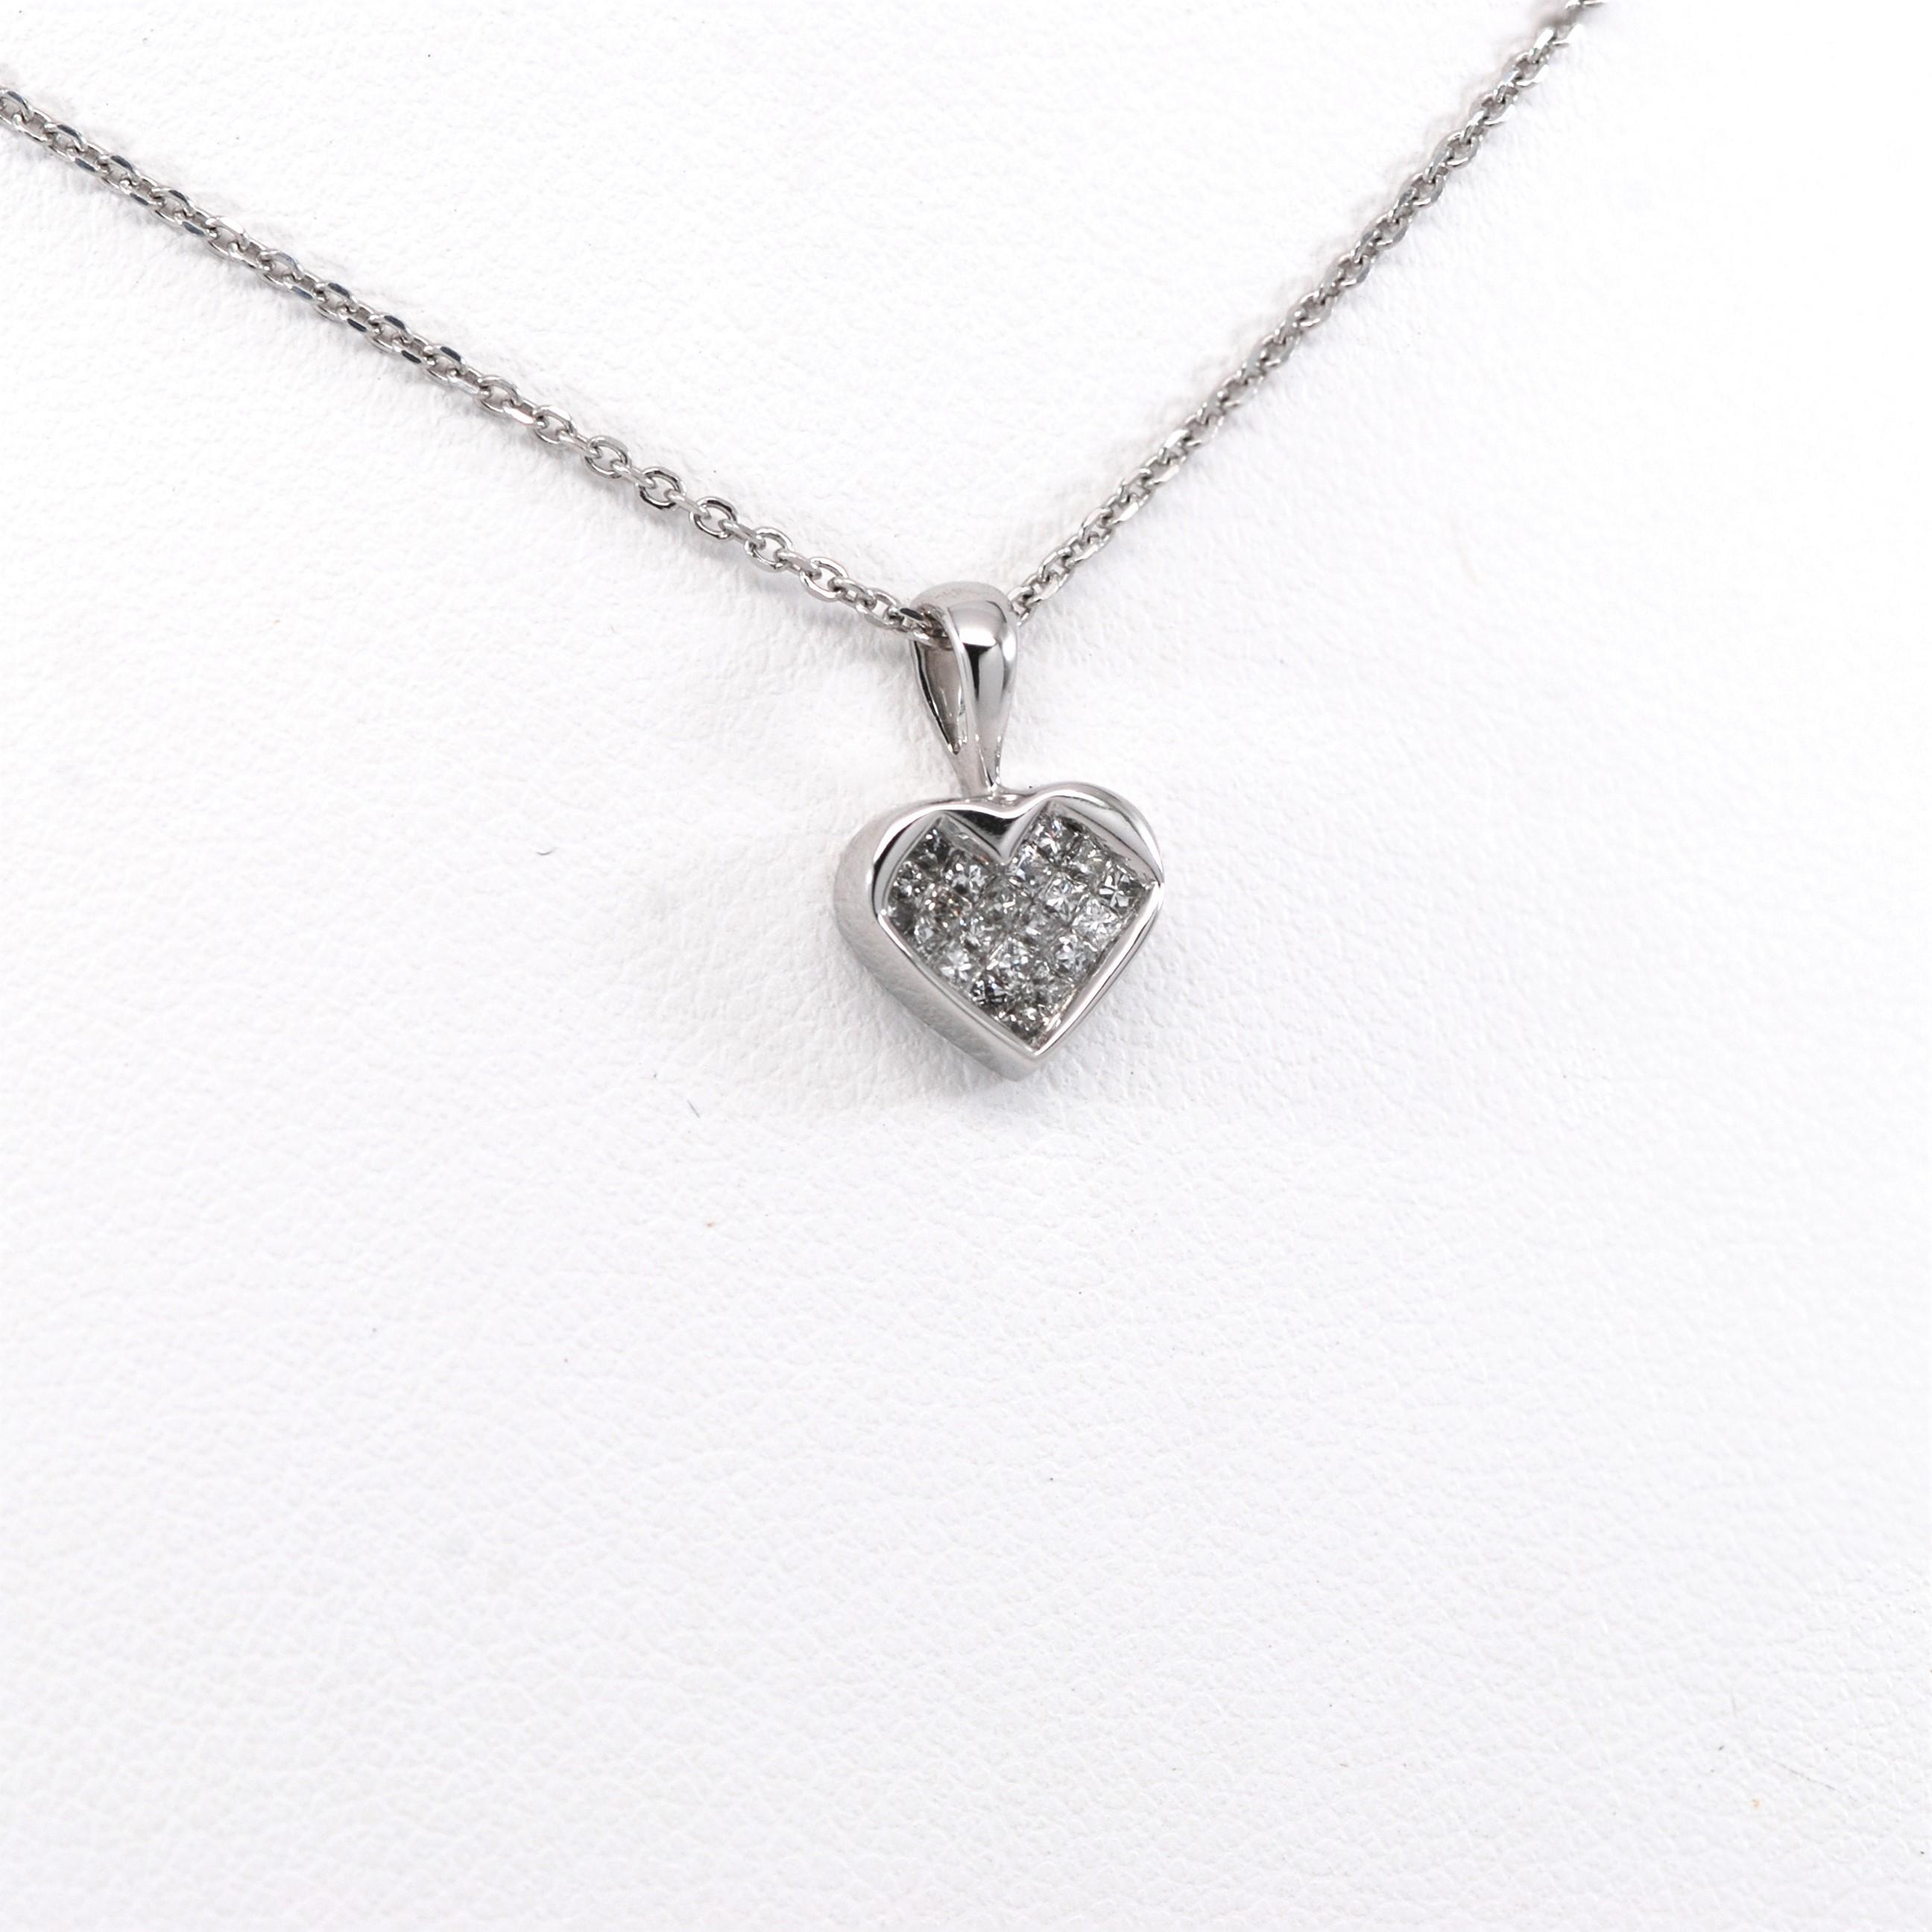 14ctw princess diamond heart pendant charm 14k white gold kappys 14ctw princess cut diamond heart pendant charm 14k white gold aloadofball Images